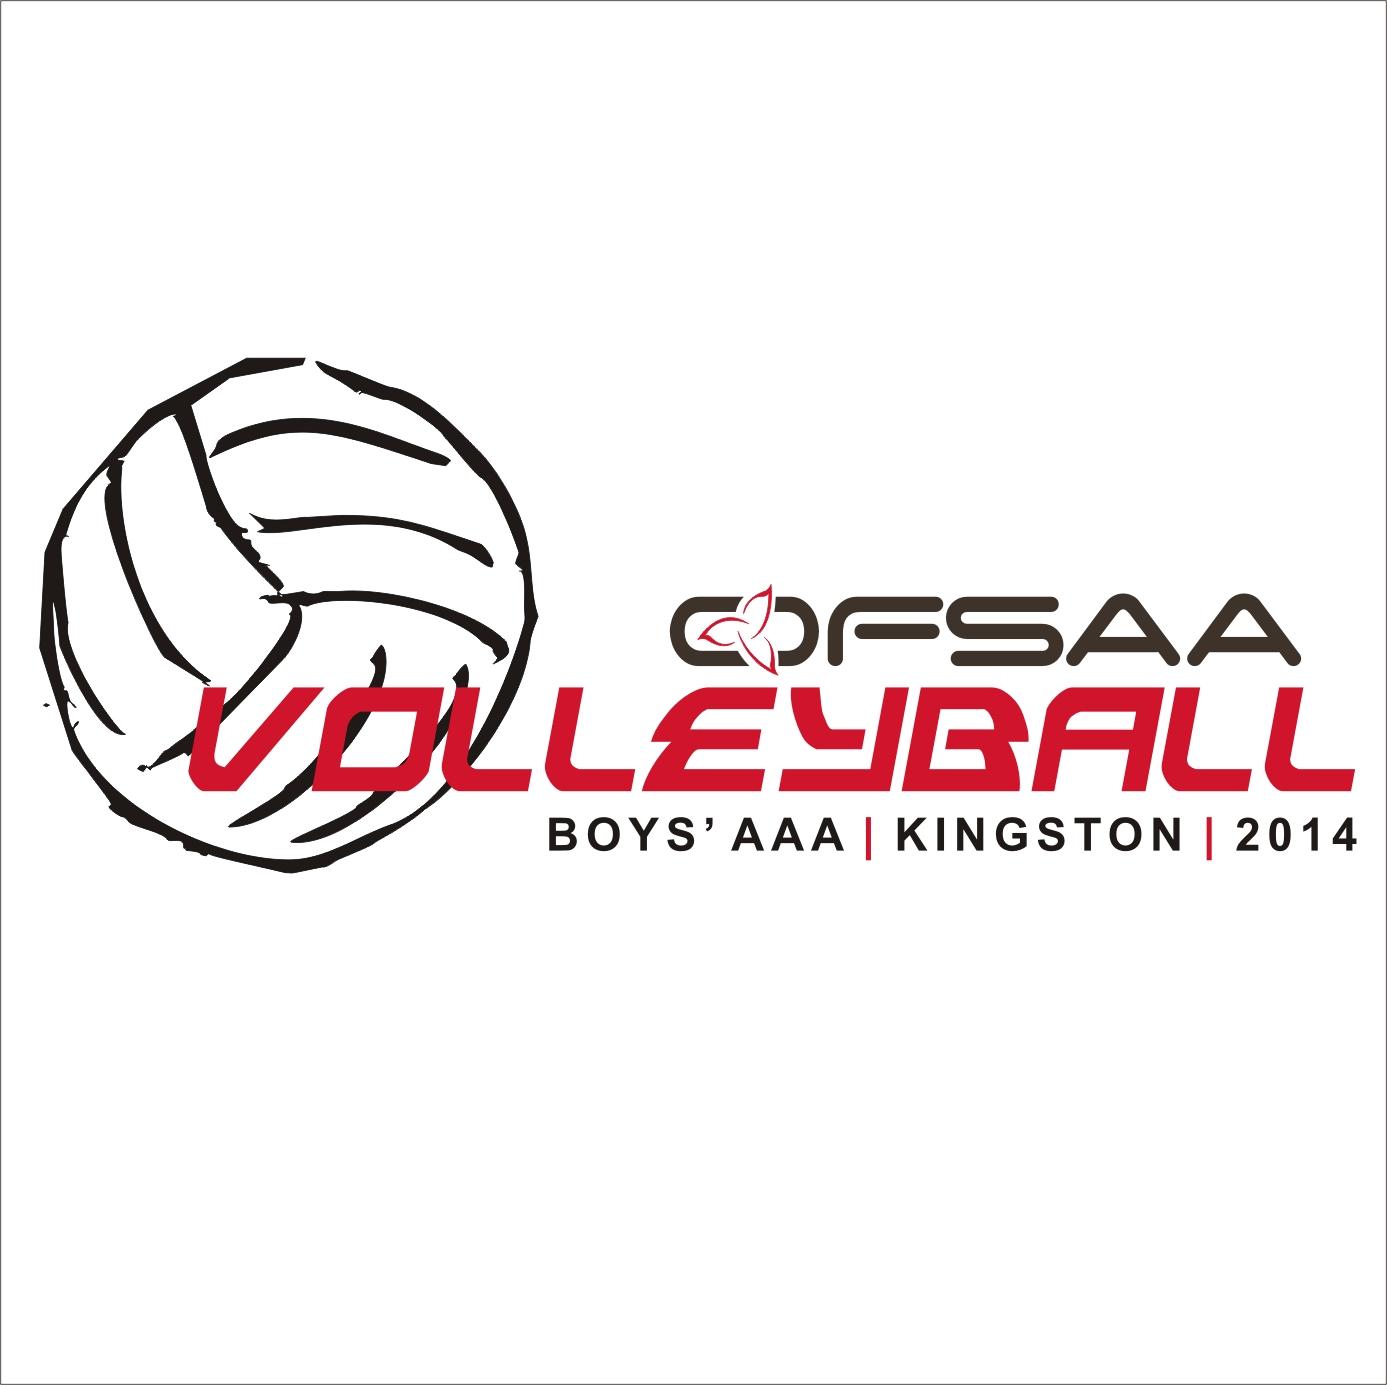 Boys 3A Vball logo on white.jpg